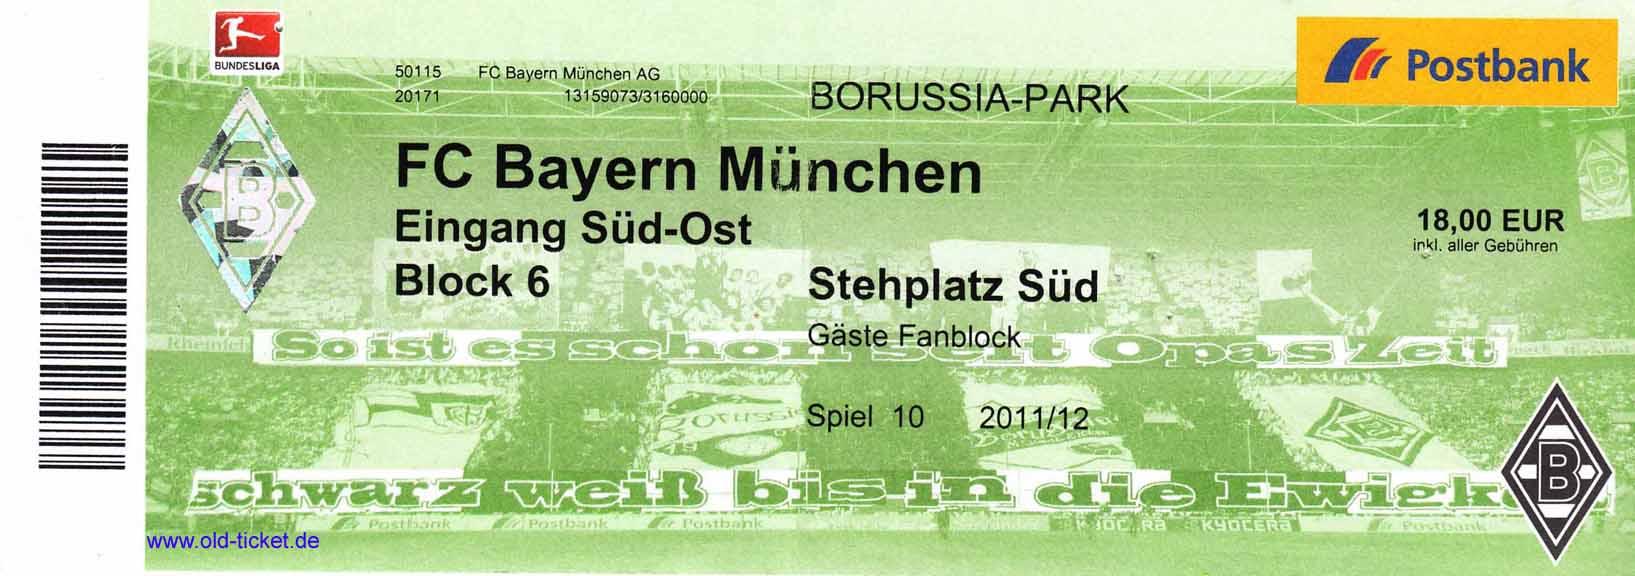 mönchengladbach borussia tickets